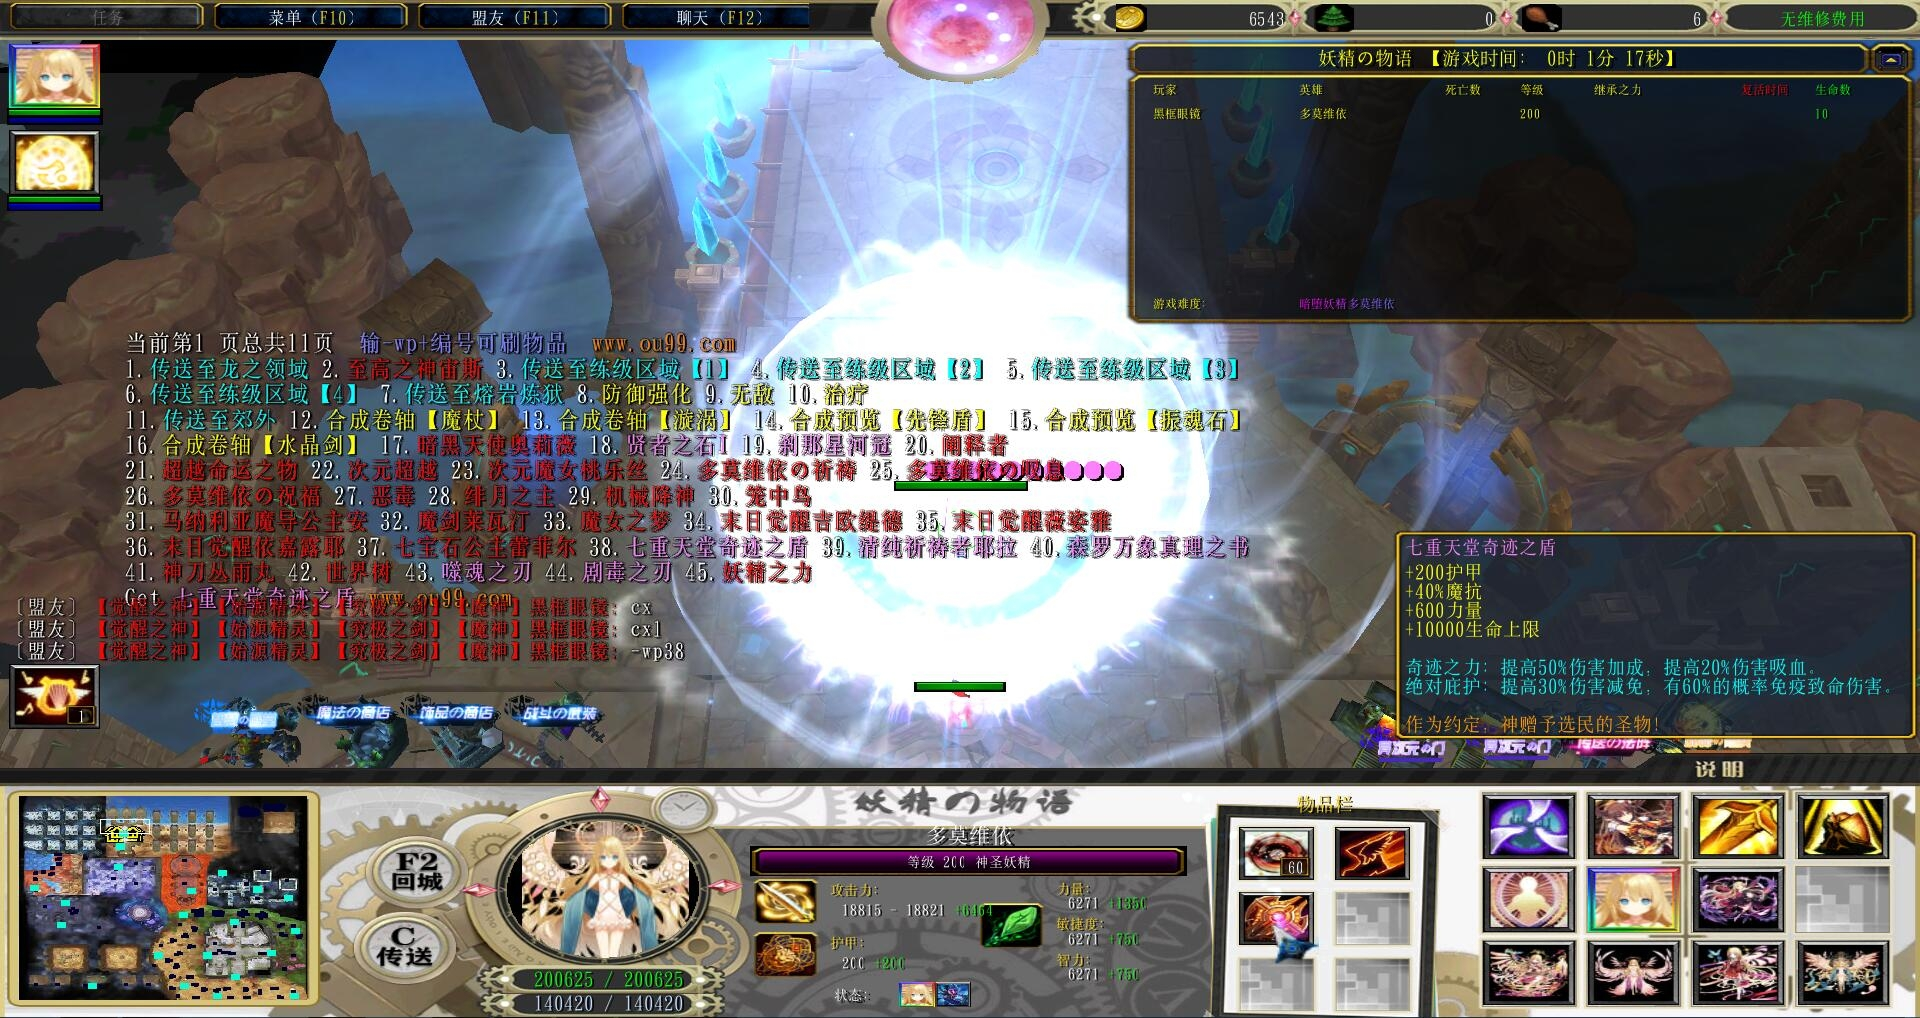 妖精の物语2.69b黑式破解